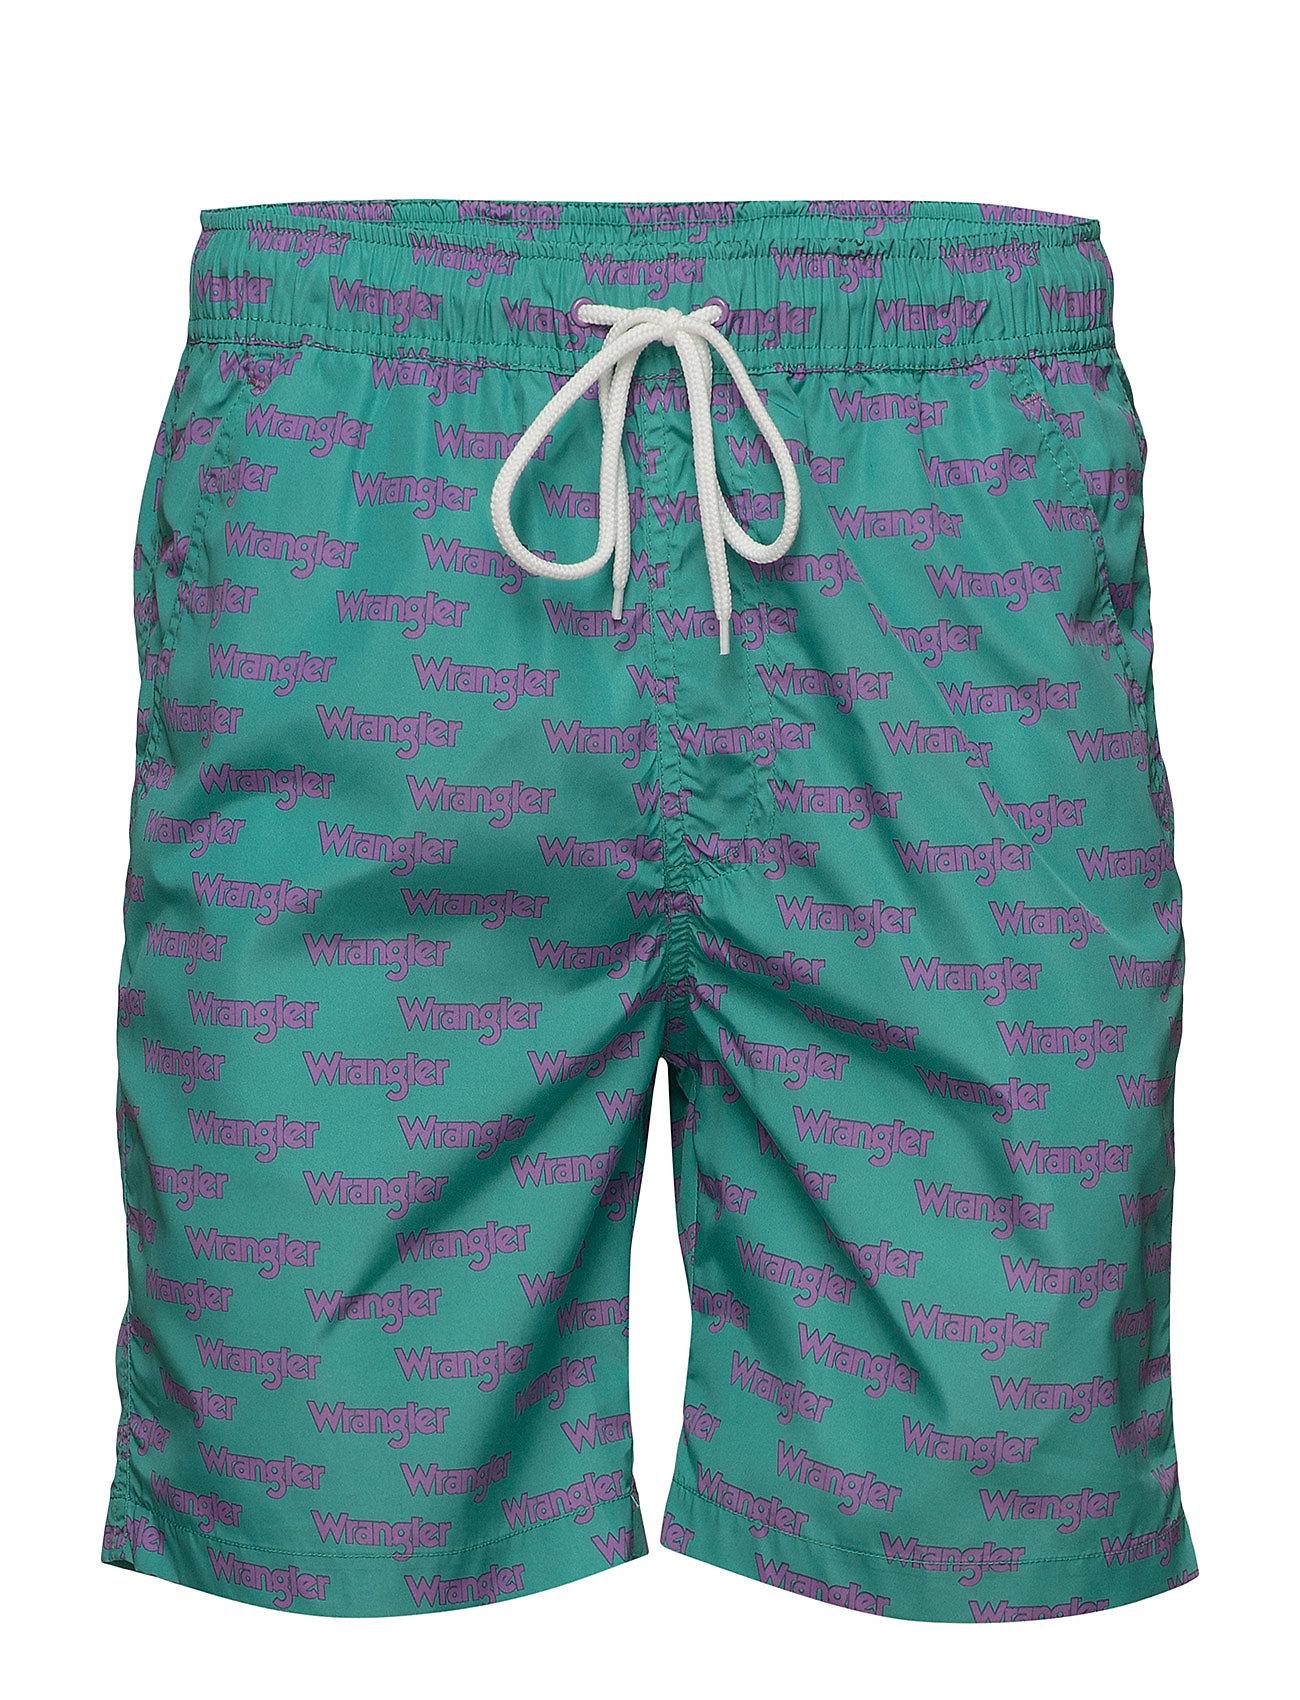 f12c6377833b9 Wrangler Swim Short (Beach Glass), (22.92 €) | Large selection of ...